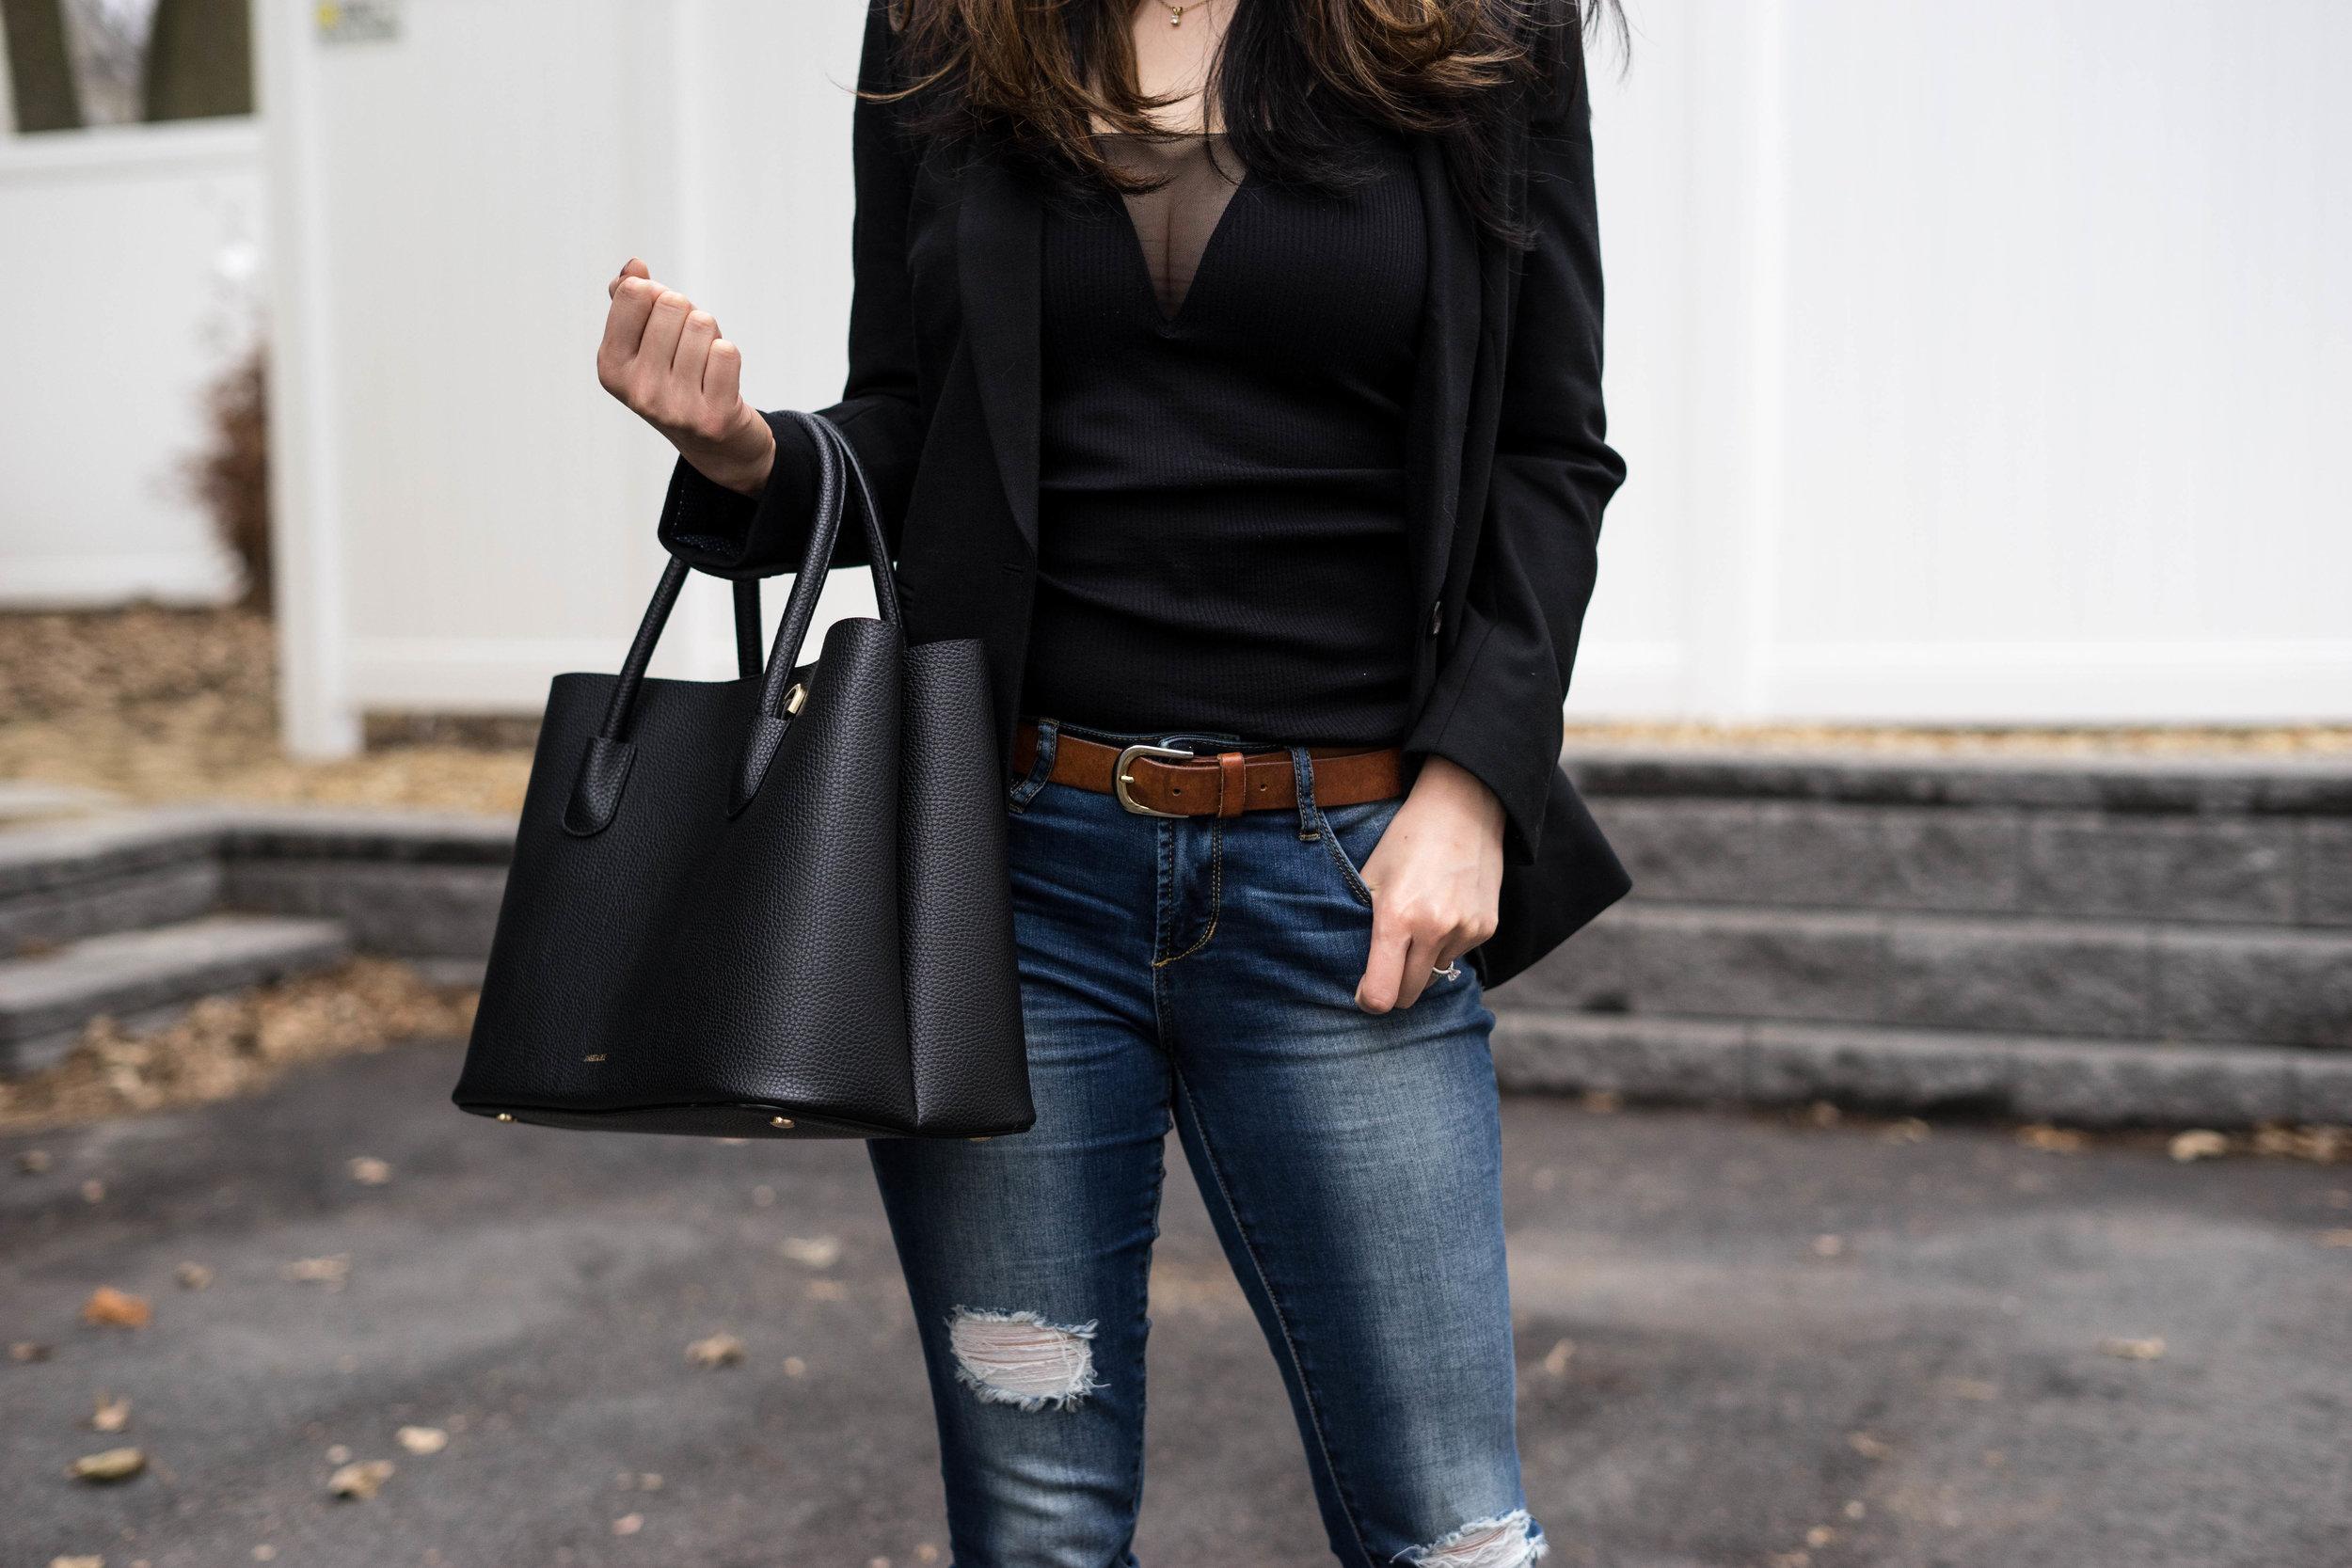 J.Crew Blazer & Jeans with a V-Neck Mesh Tank Top -TheNinesBlog.com: A Boston Blog